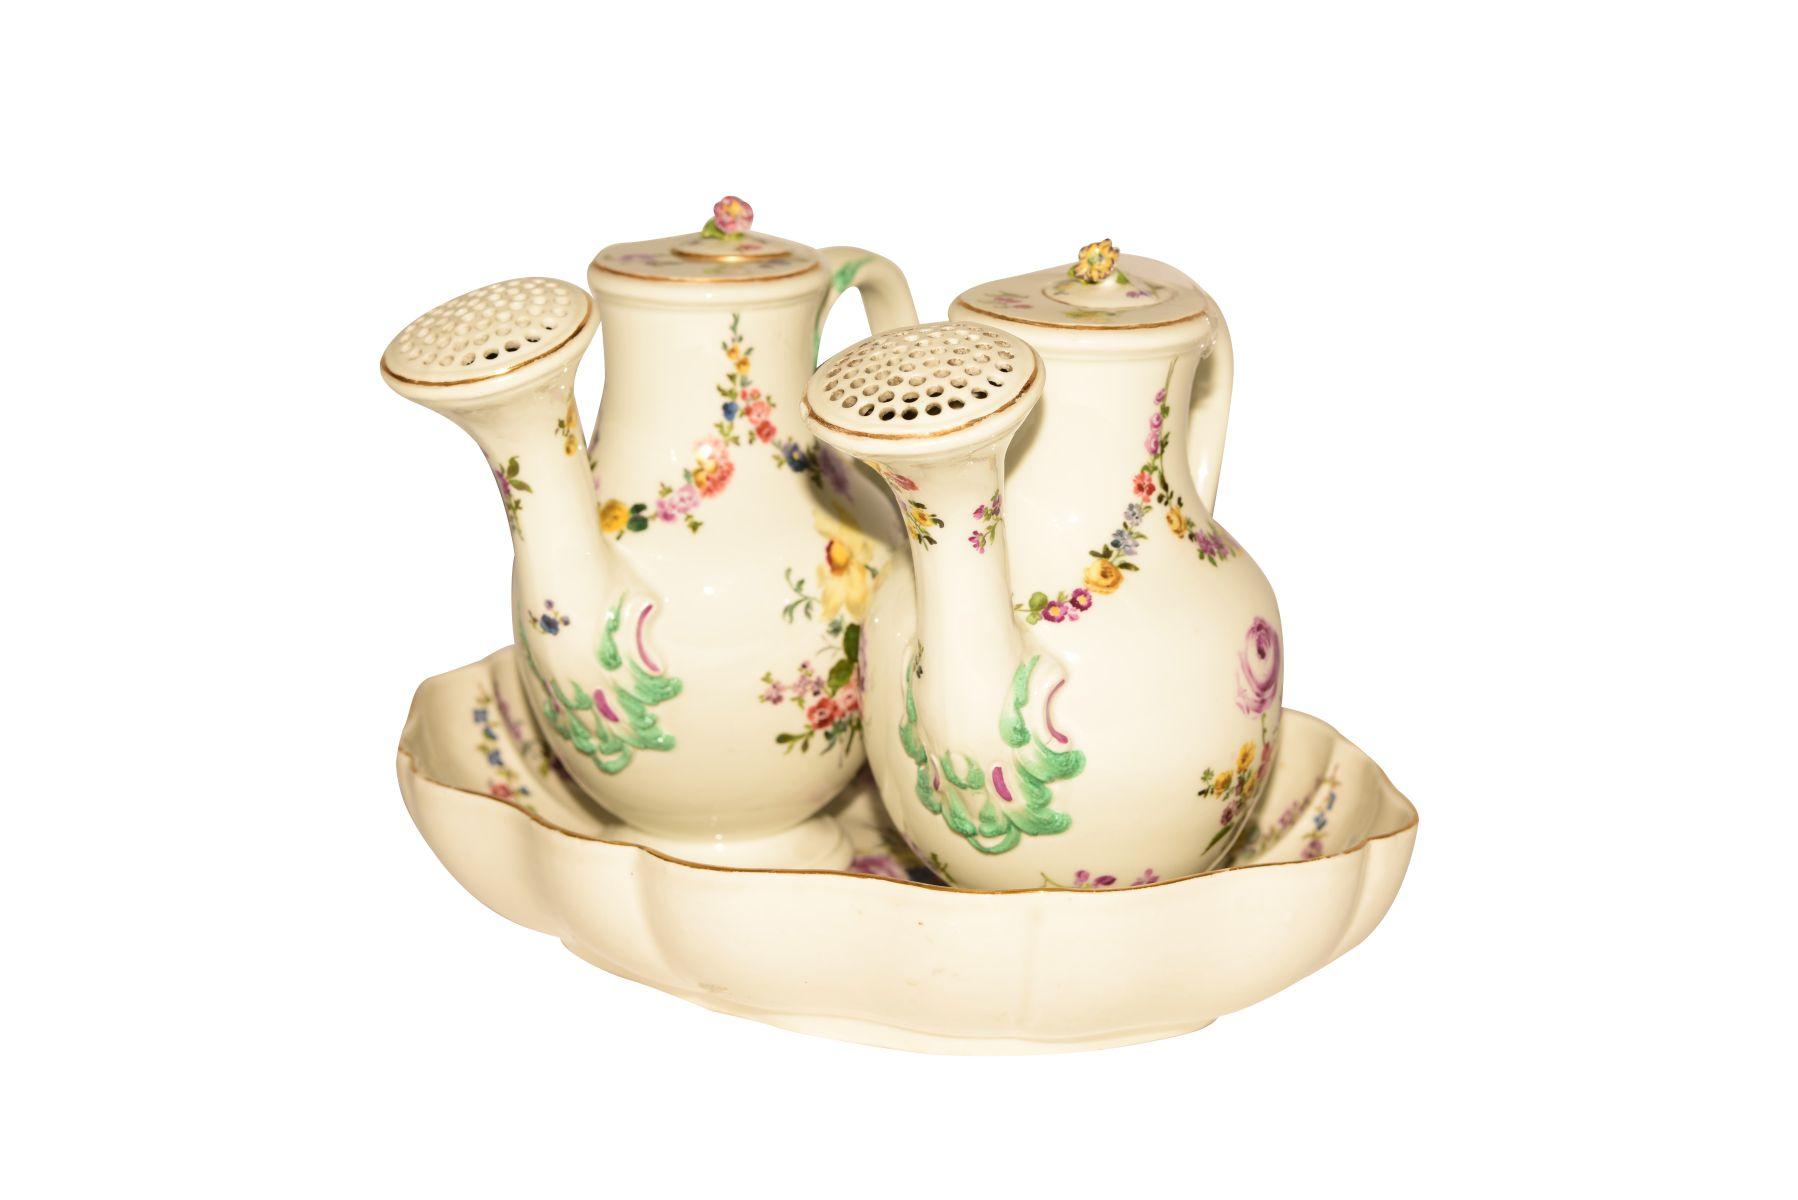 #49 Flower pots on Présentoir Meissen 1730 | Blumenkannen auf Présentoir Meissen 1730 Image